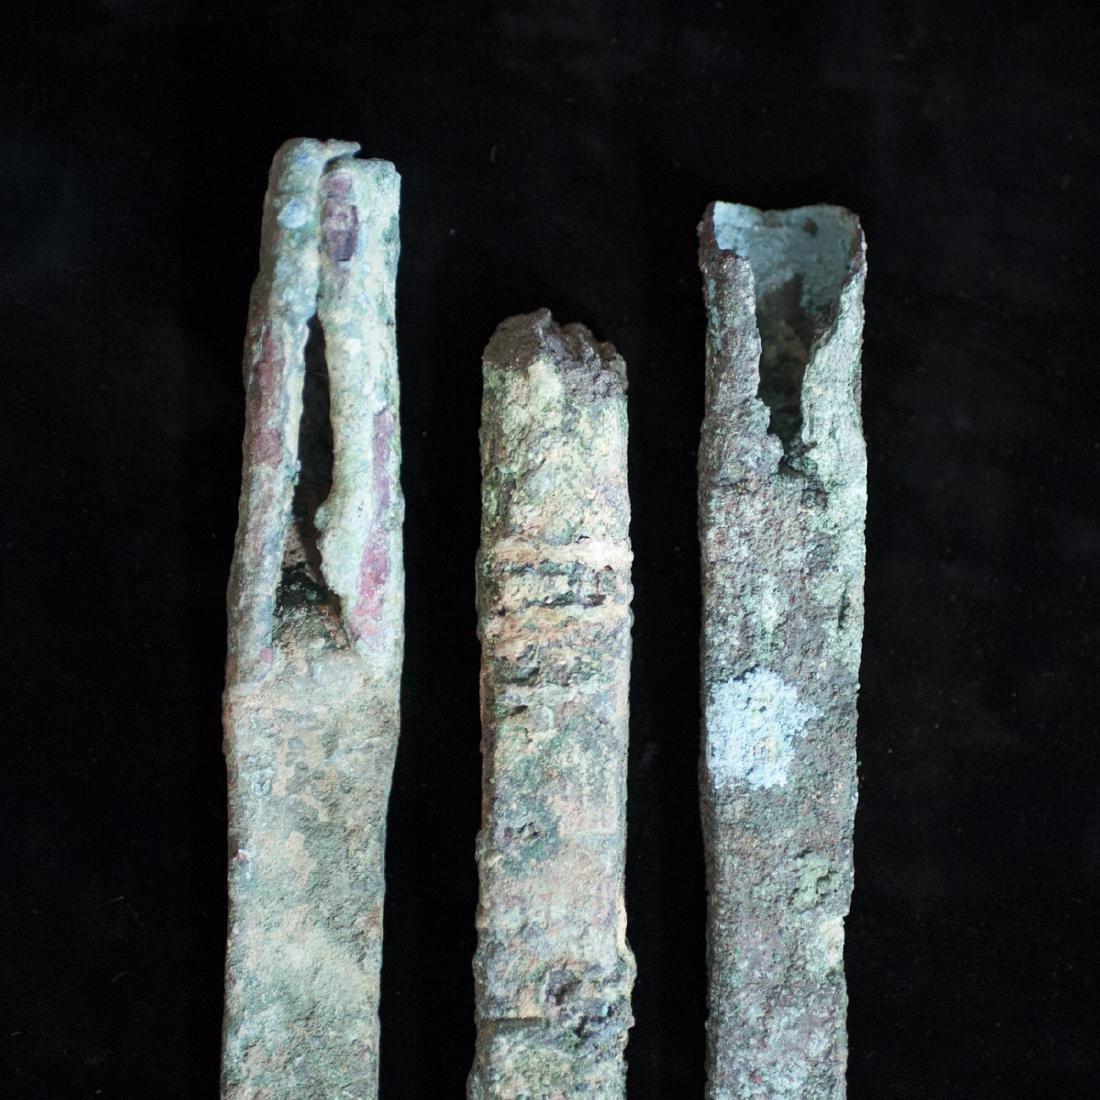 Pre-Columbian Copper Tool Fragments - 2